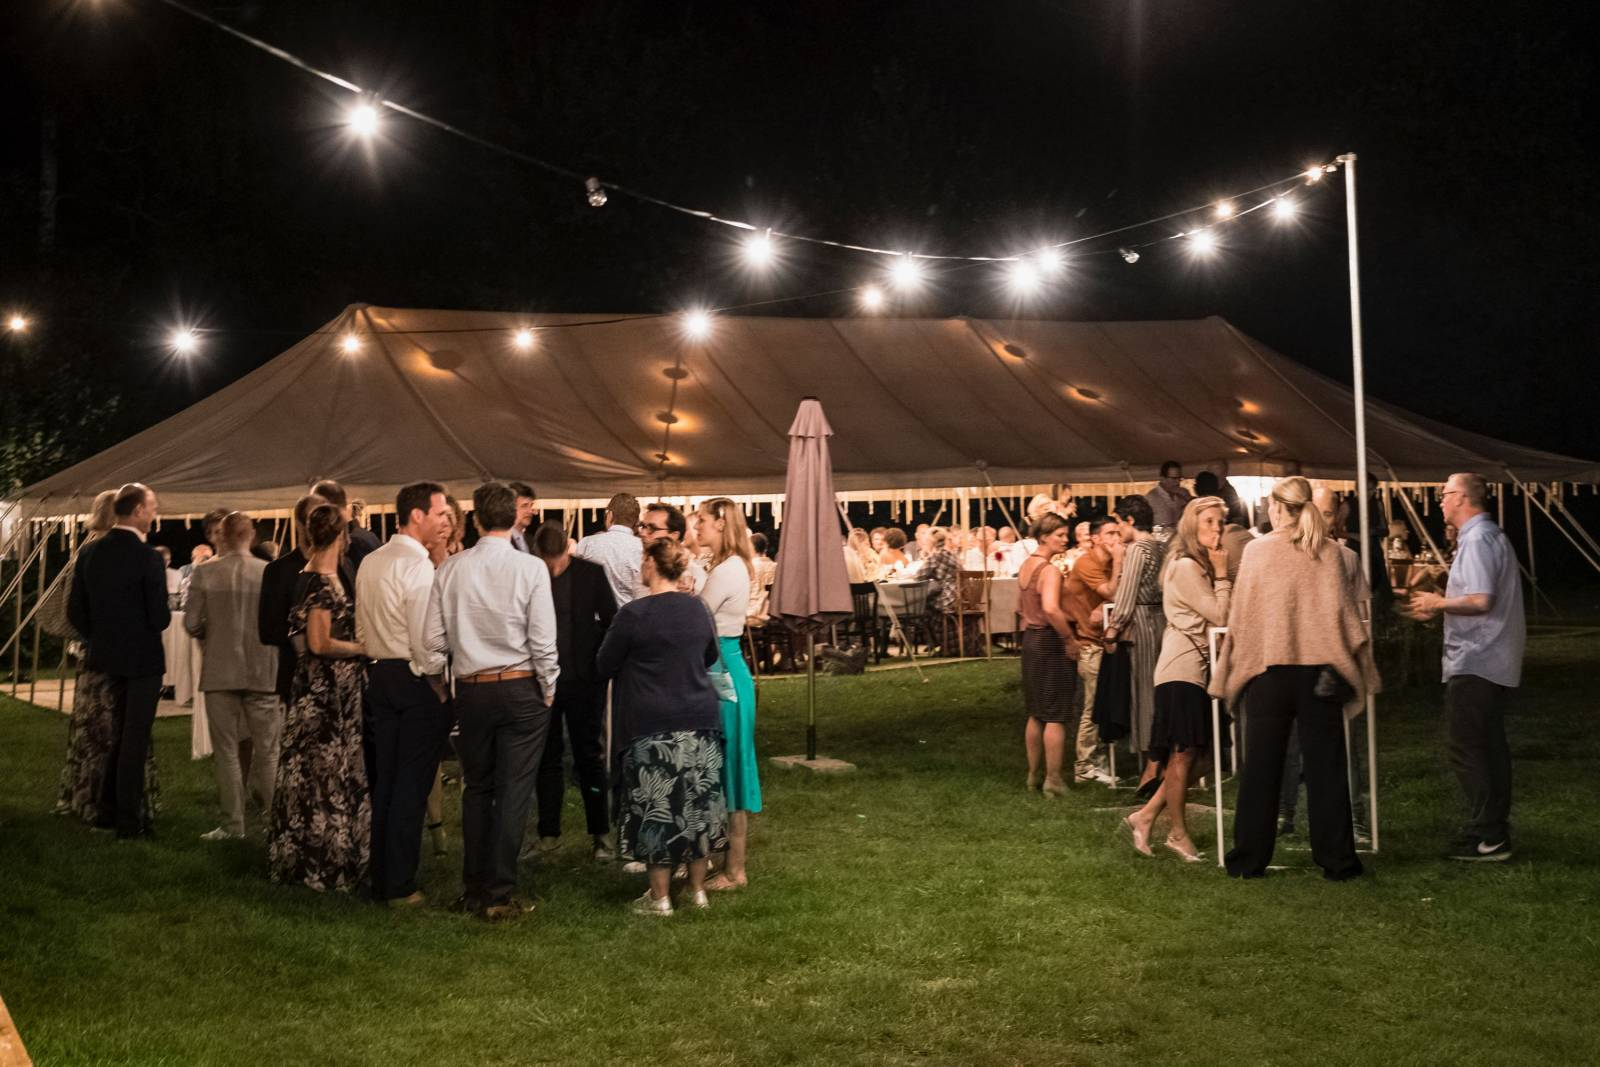 Bring it On - Catering - Fotograaf Dirk De Cubber - House of Weddings - 2